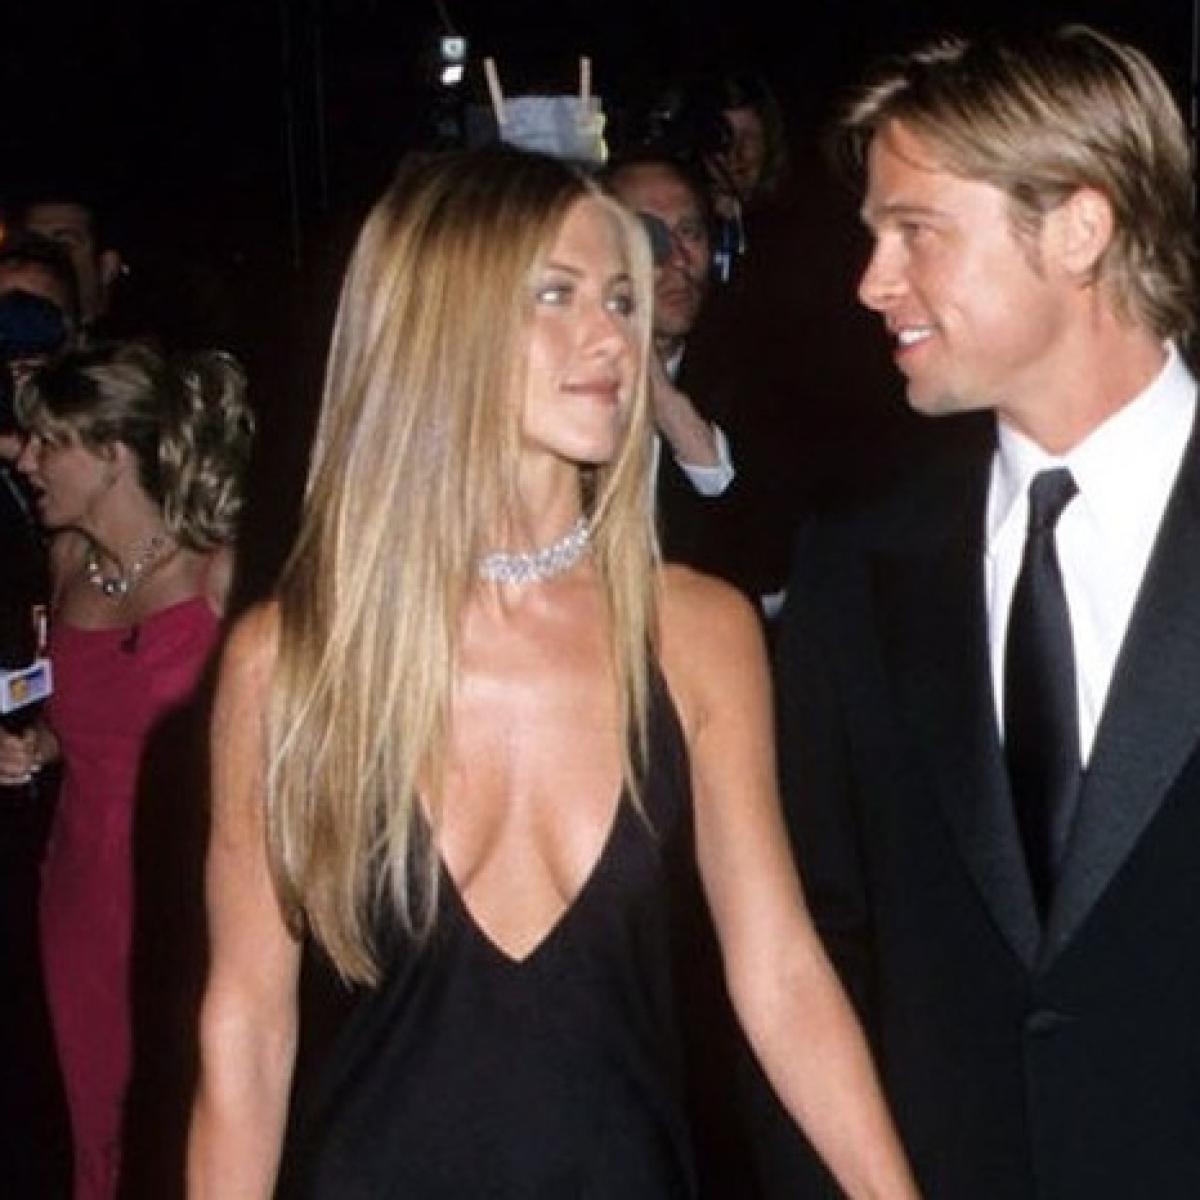 Brad Pitt attends ex-wife Jennifer Aniston's Christmas party